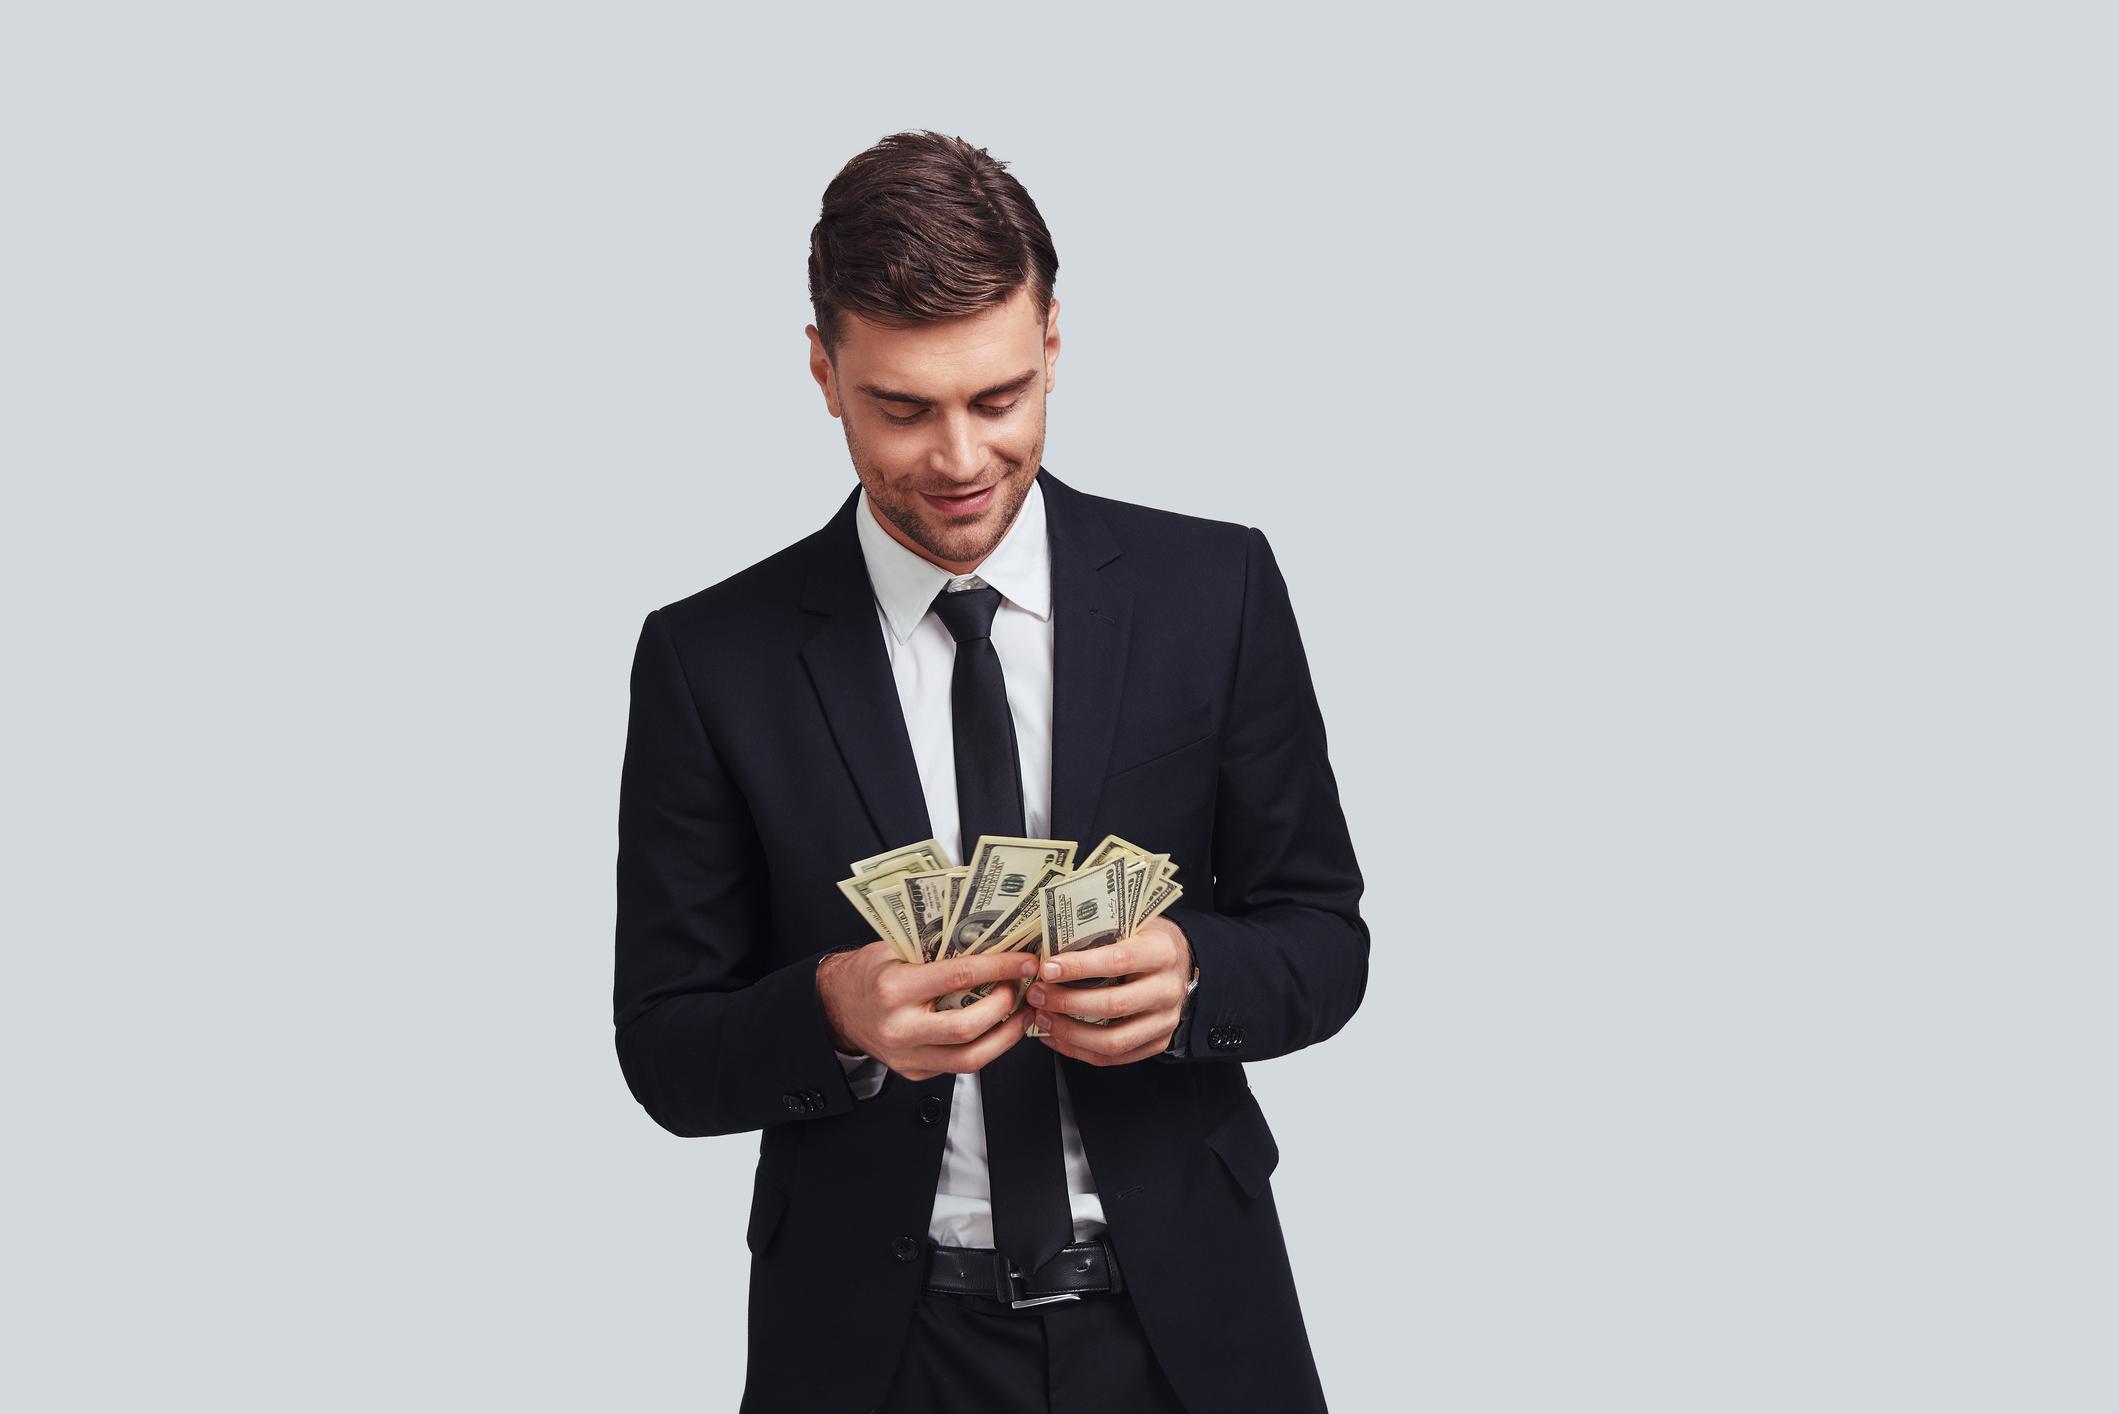 4 Tricks Billionaires Use To Make Their Money Work For